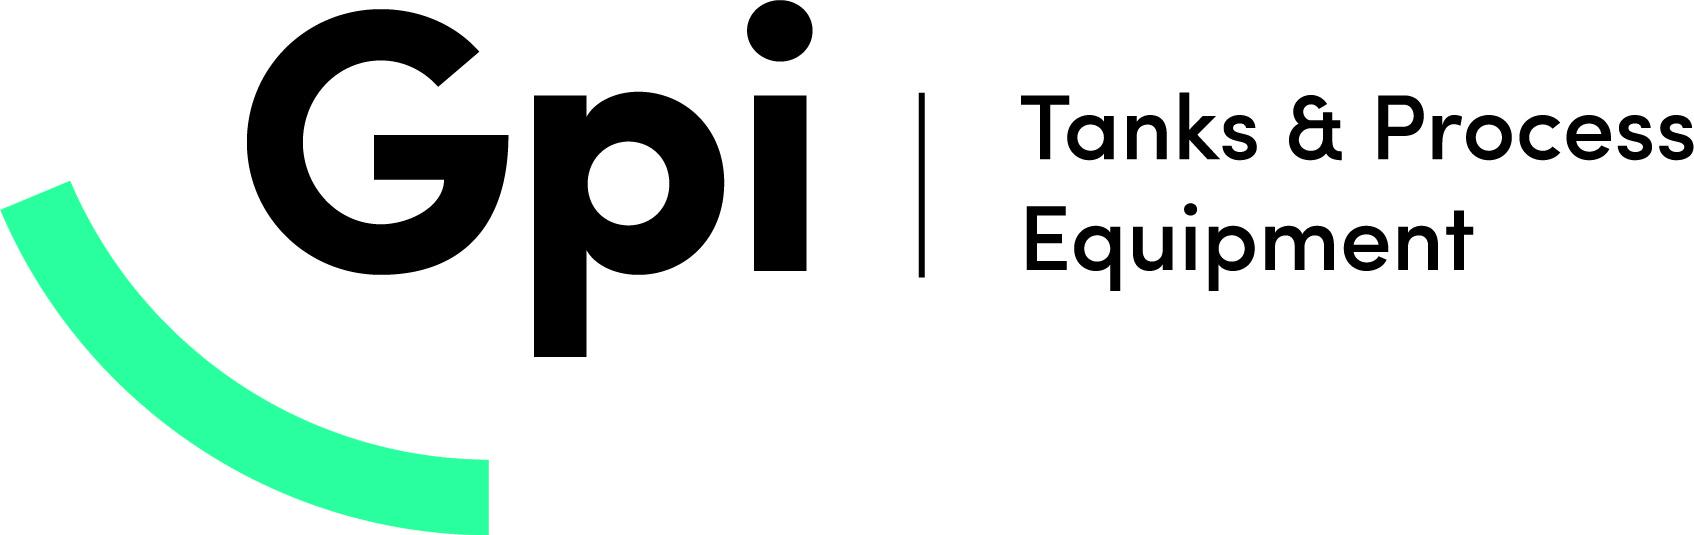 GPI Tanks&Process Equipment